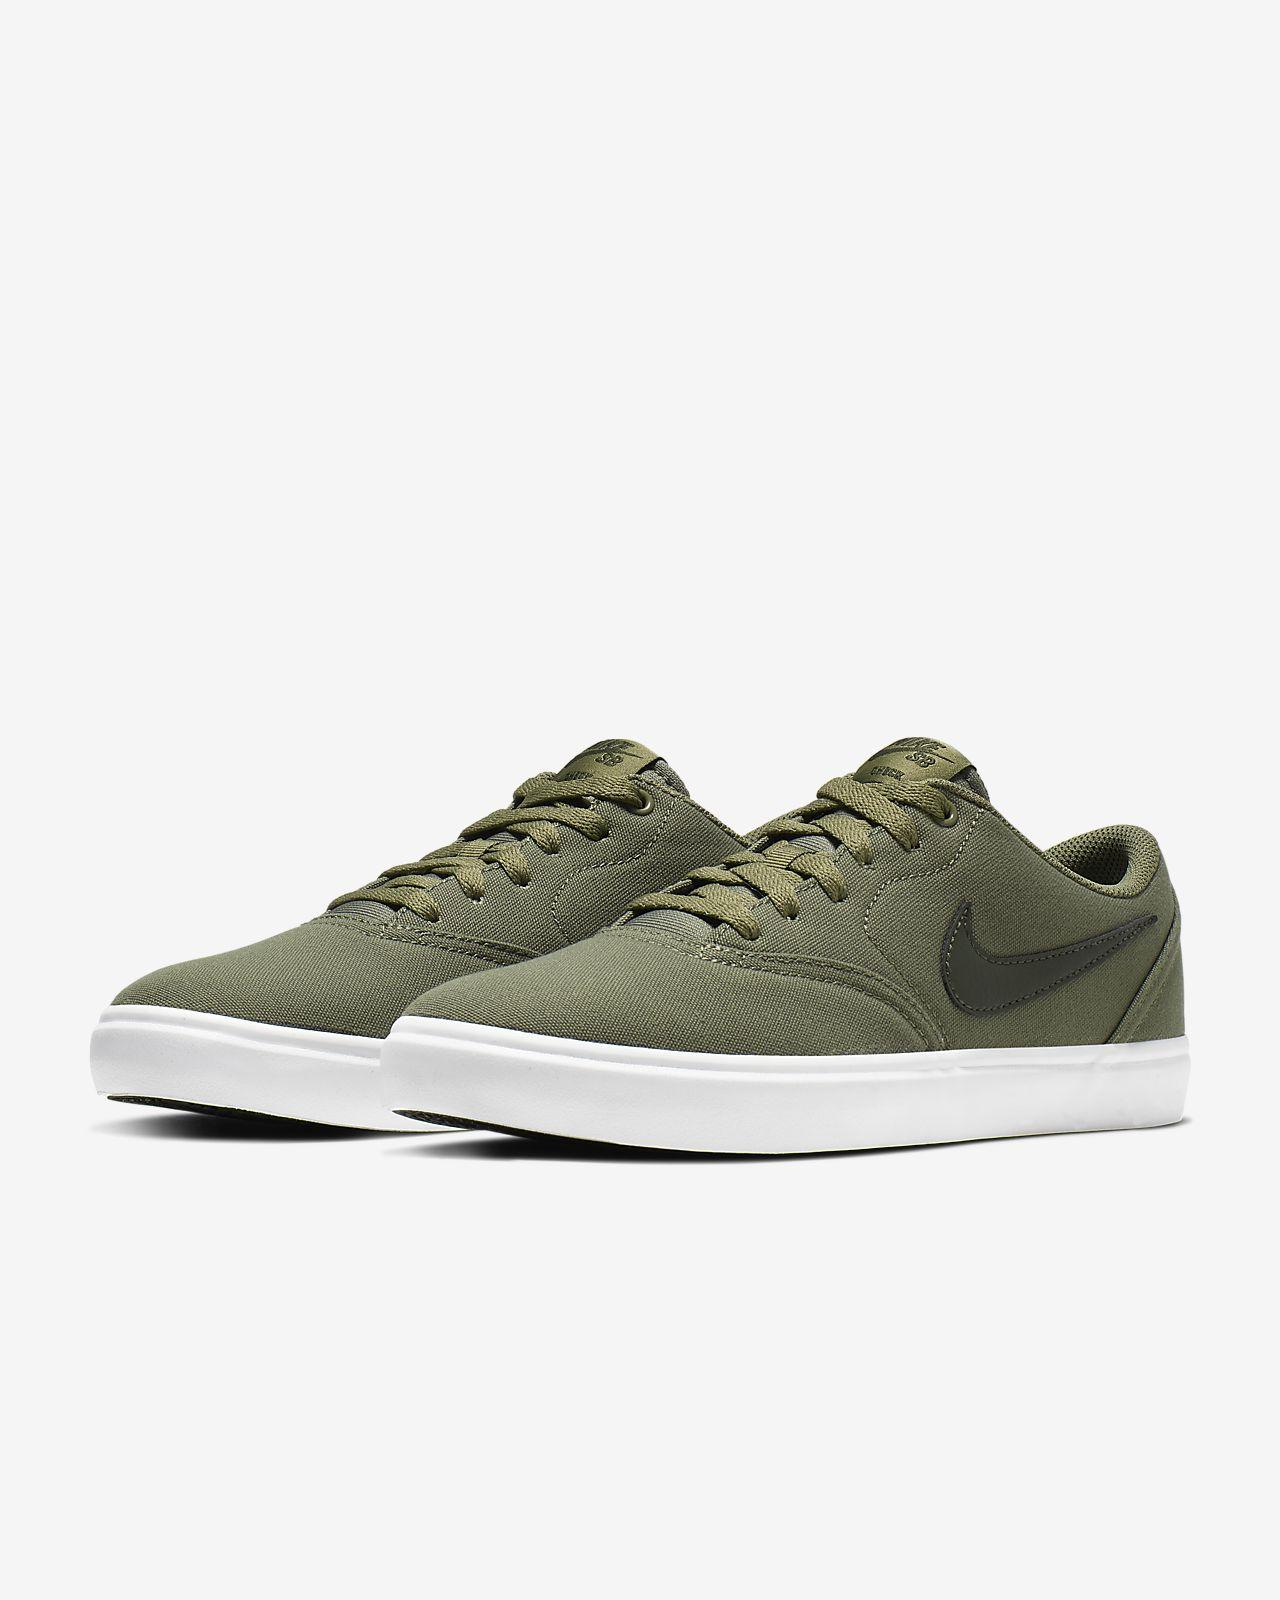 pretty nice 7b3f1 1acb4 ... Nike SB Check Solarsoft Canvas Men s Skateboarding Shoe